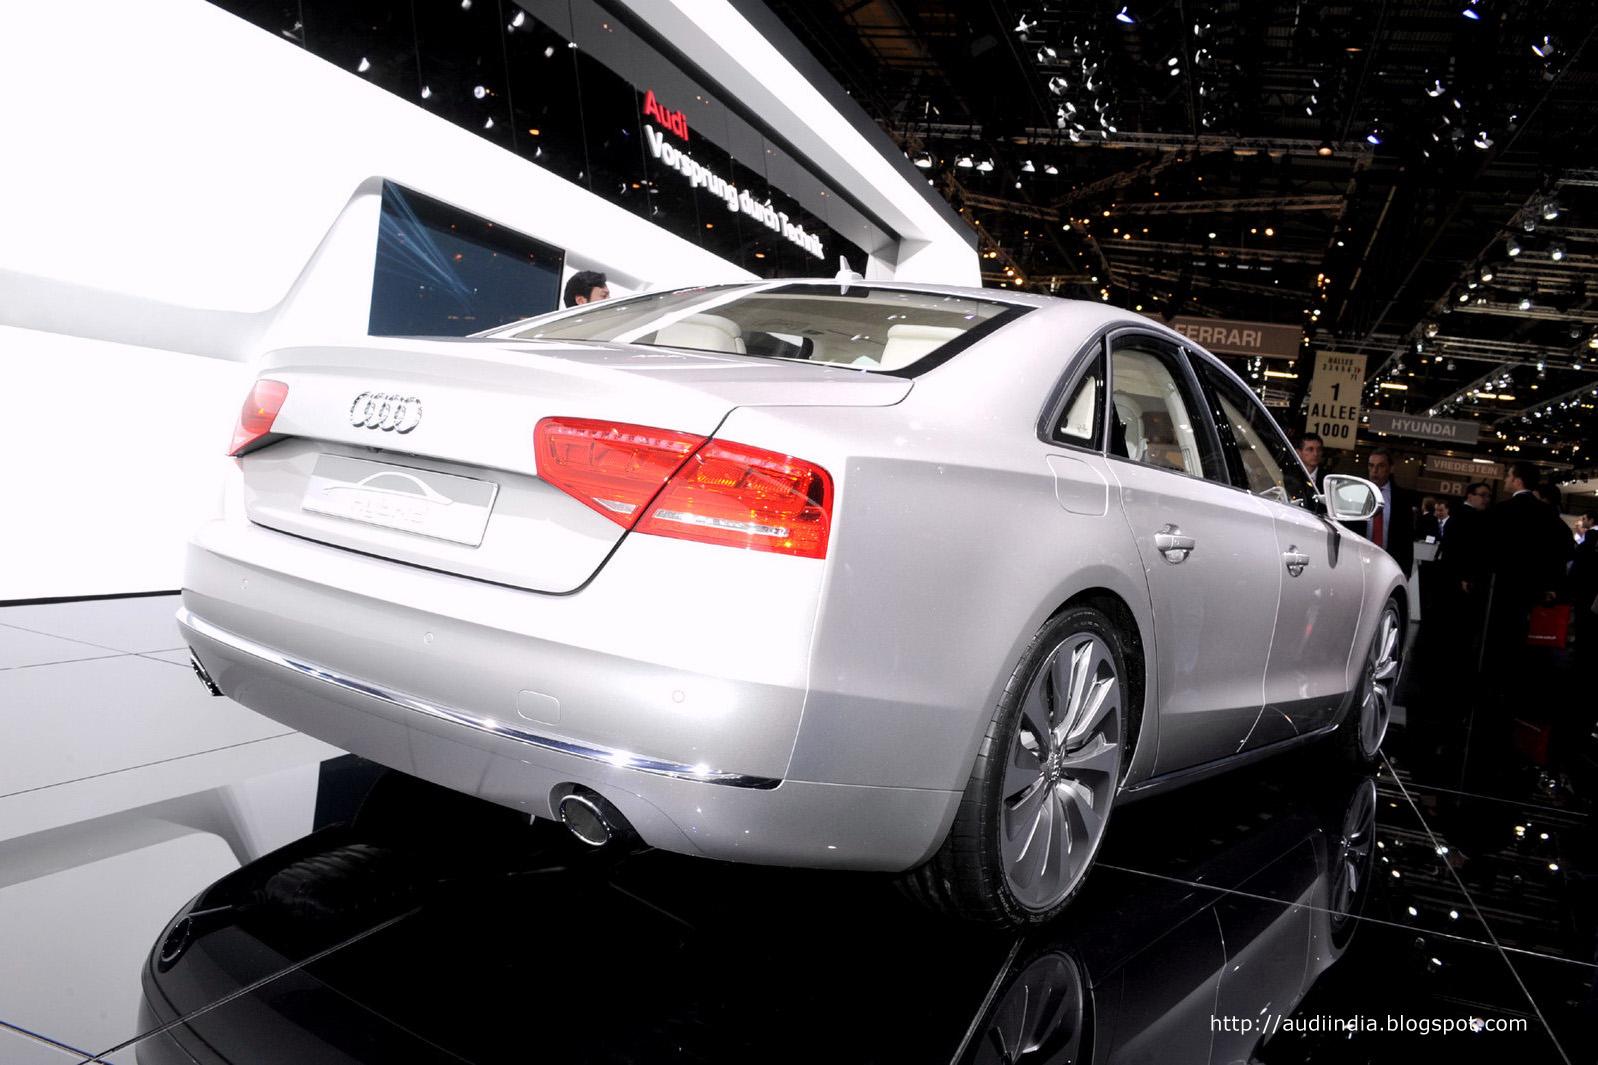 http://1.bp.blogspot.com/-aFPhKmvkv_0/To6HWTzeINI/AAAAAAAABm0/idVfw0LrB64/s1600/2011-Audi-A8-Hybrid-42+copy.jpg